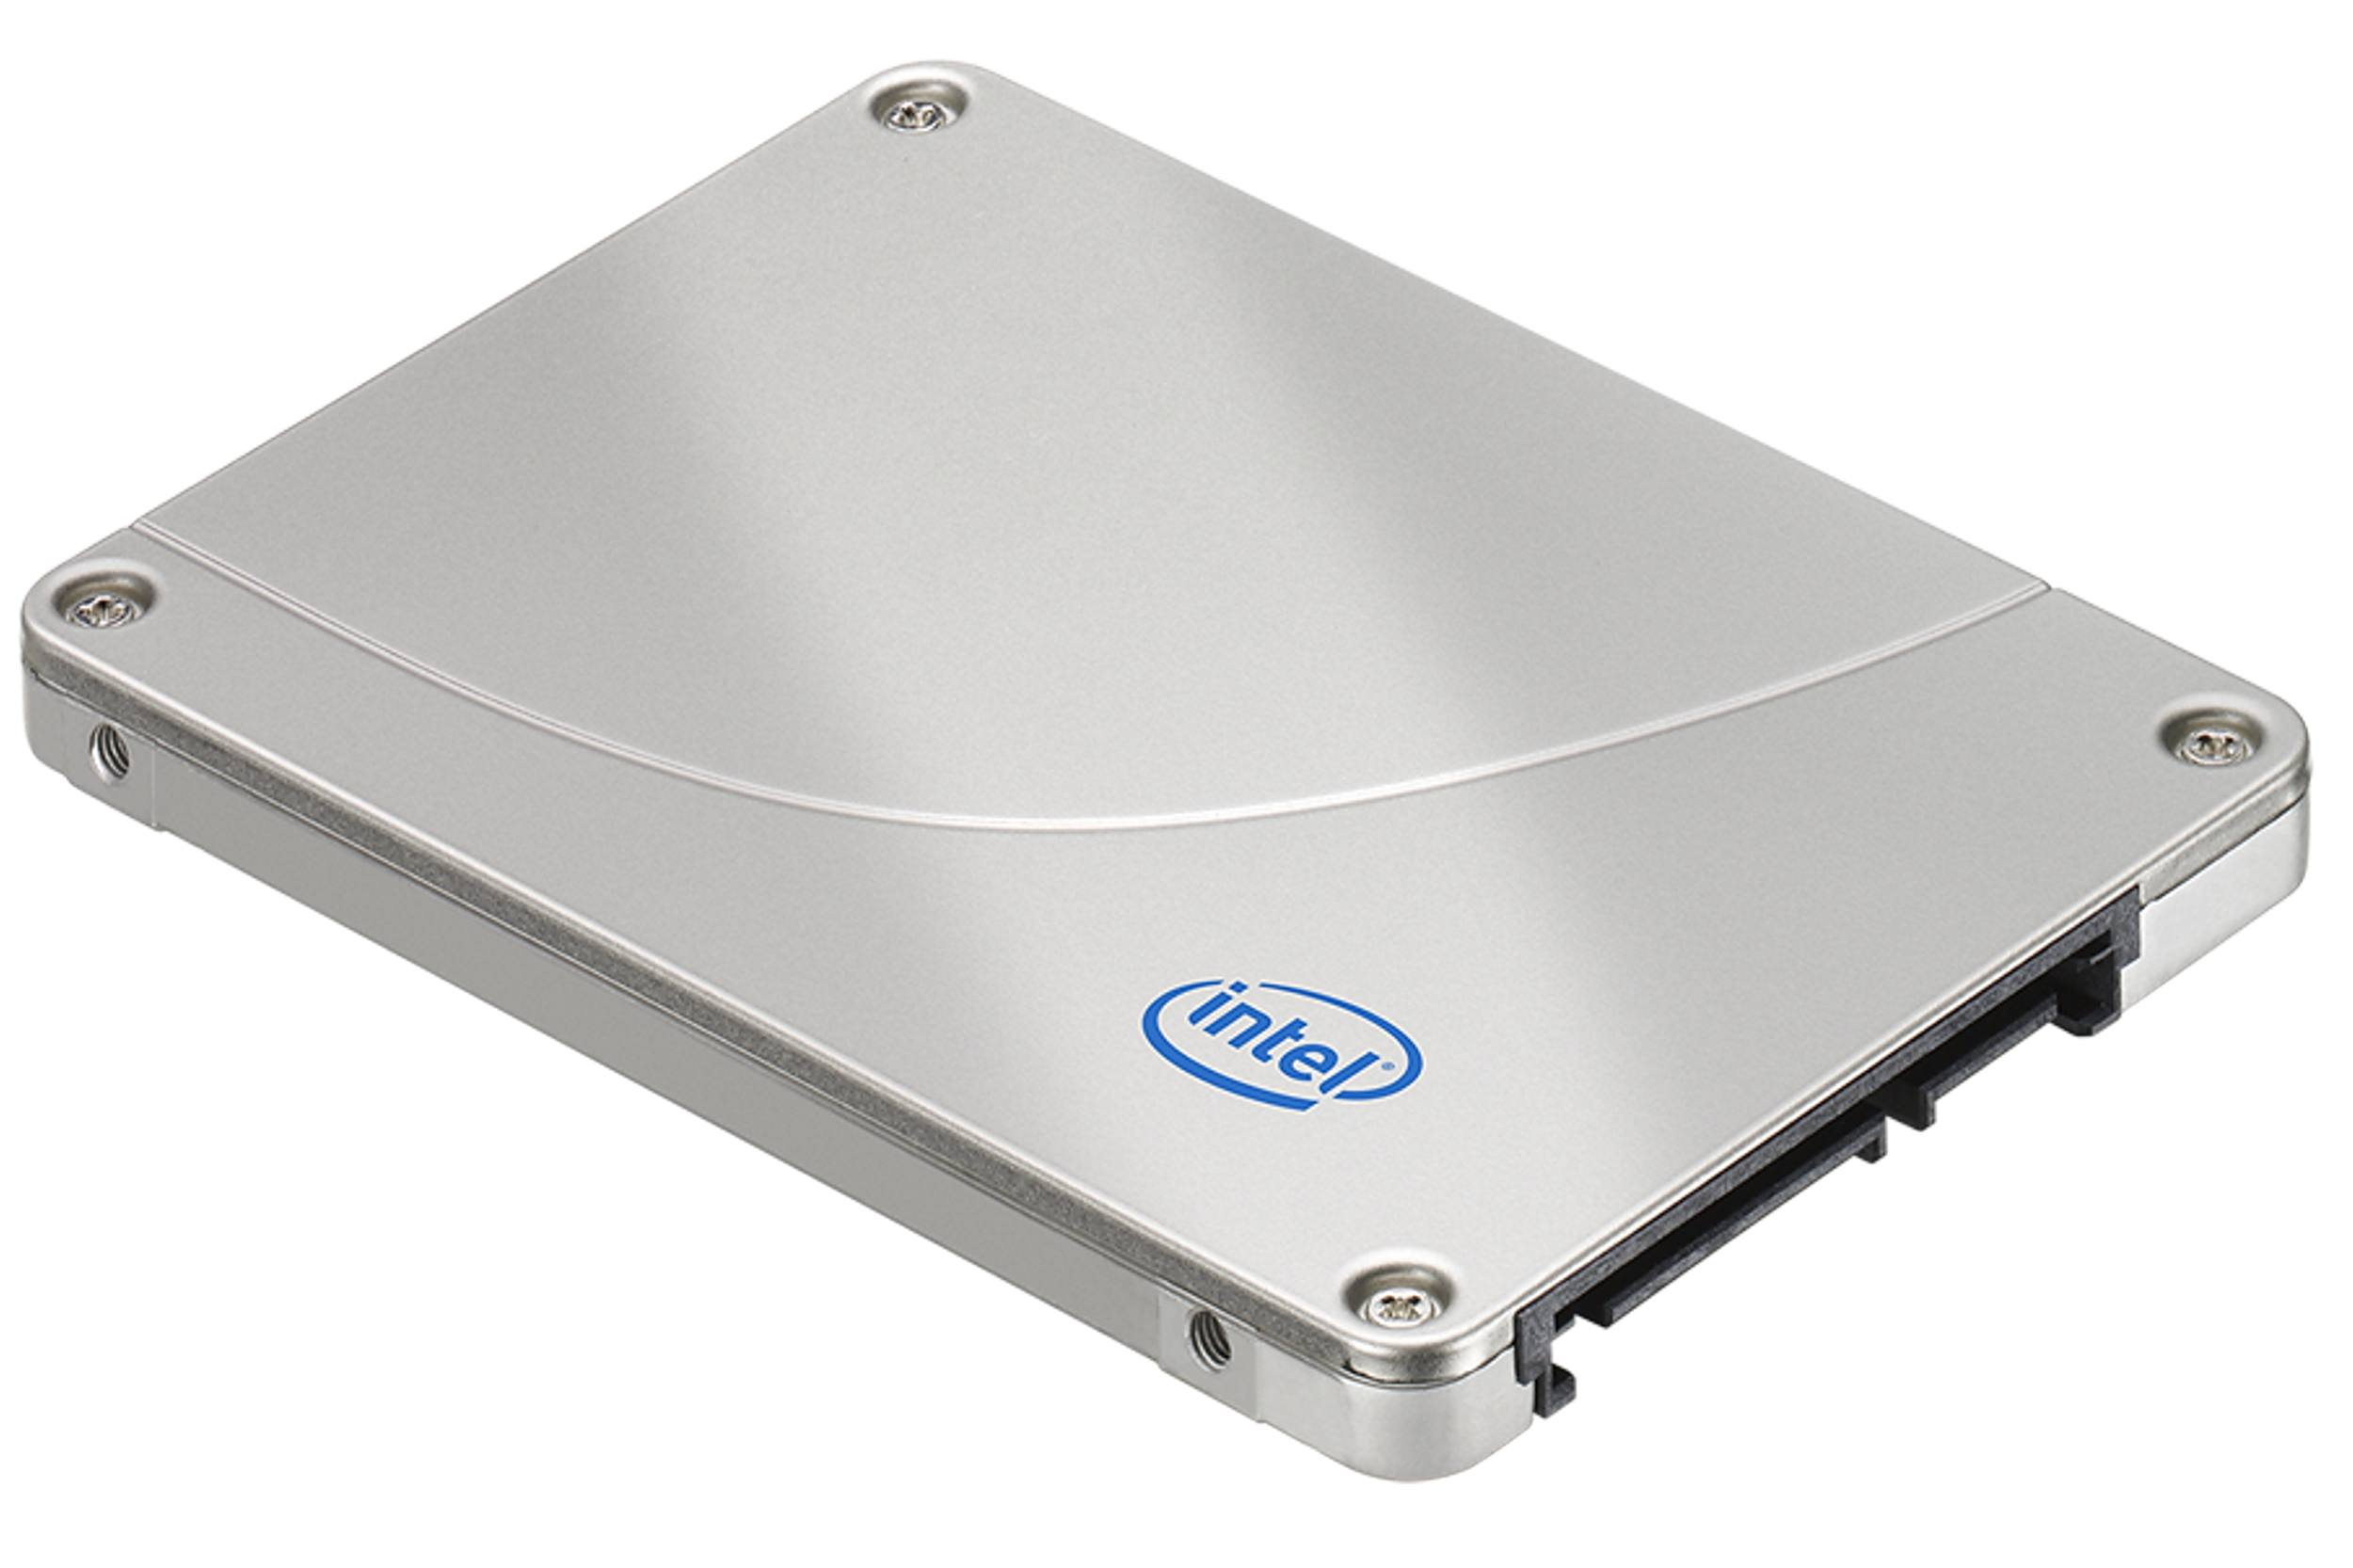 Upgrade Your Intel MacBook Pro - Guide